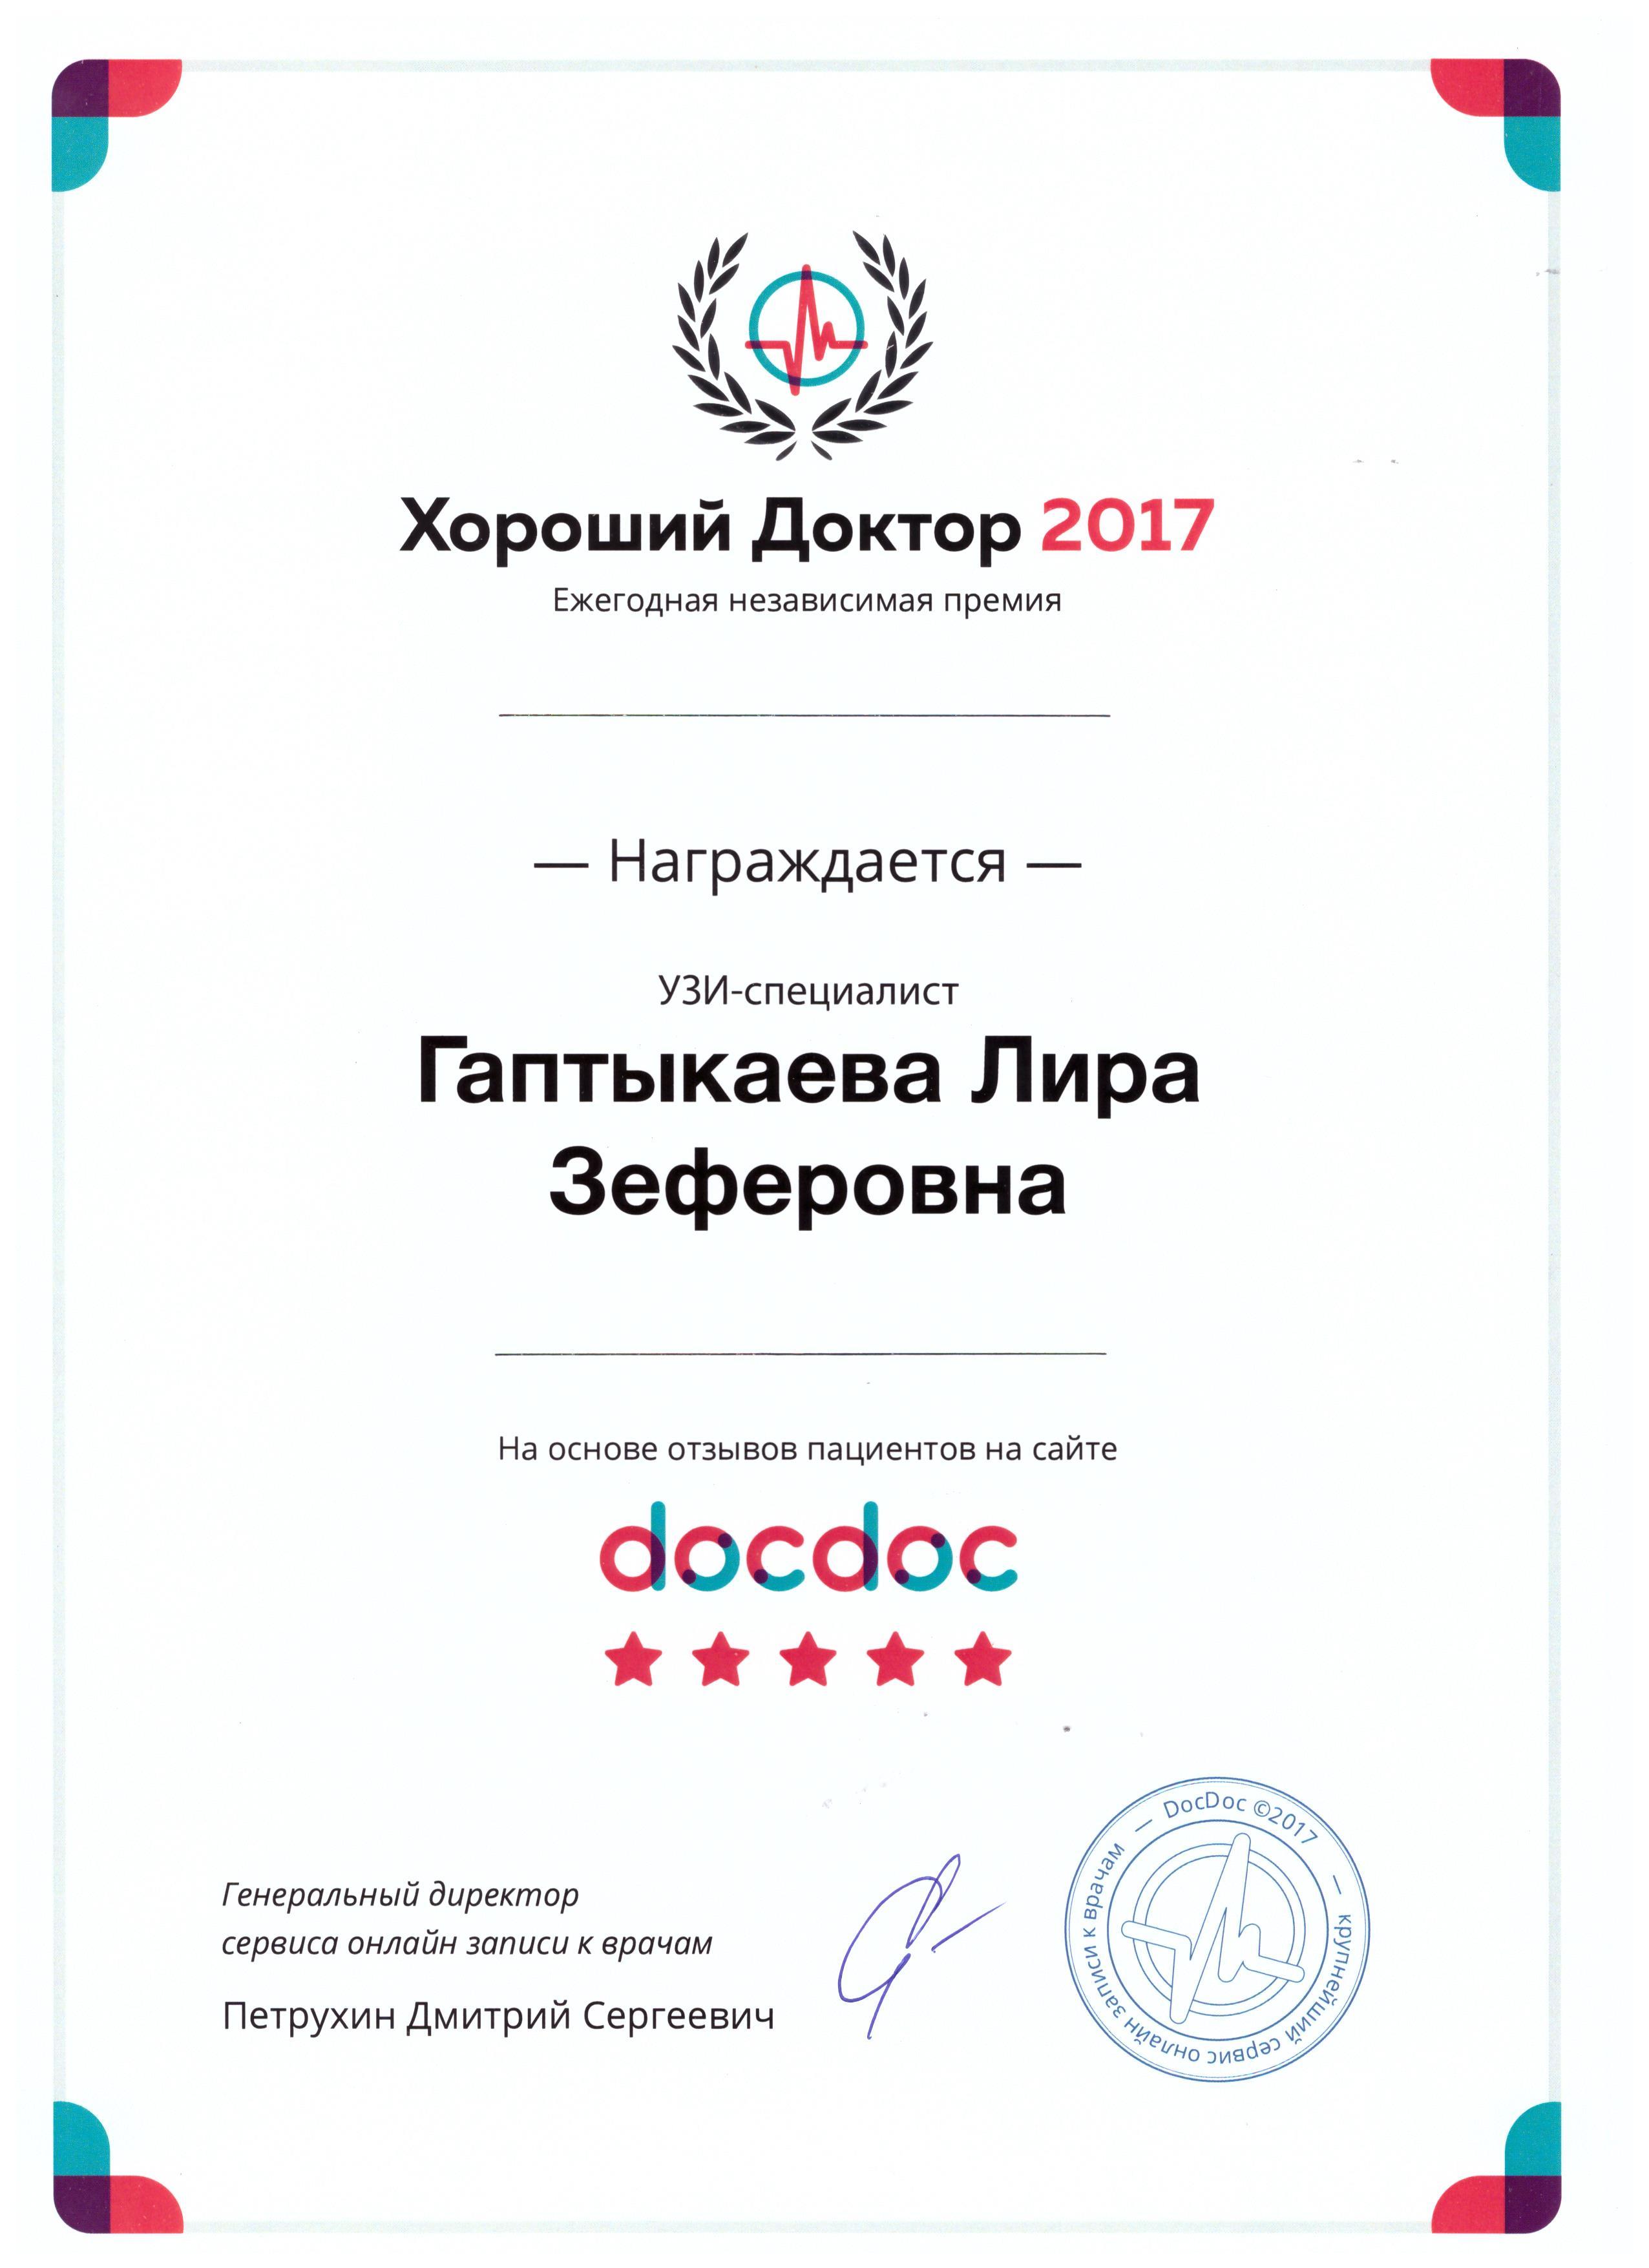 gaptikaeva 2017